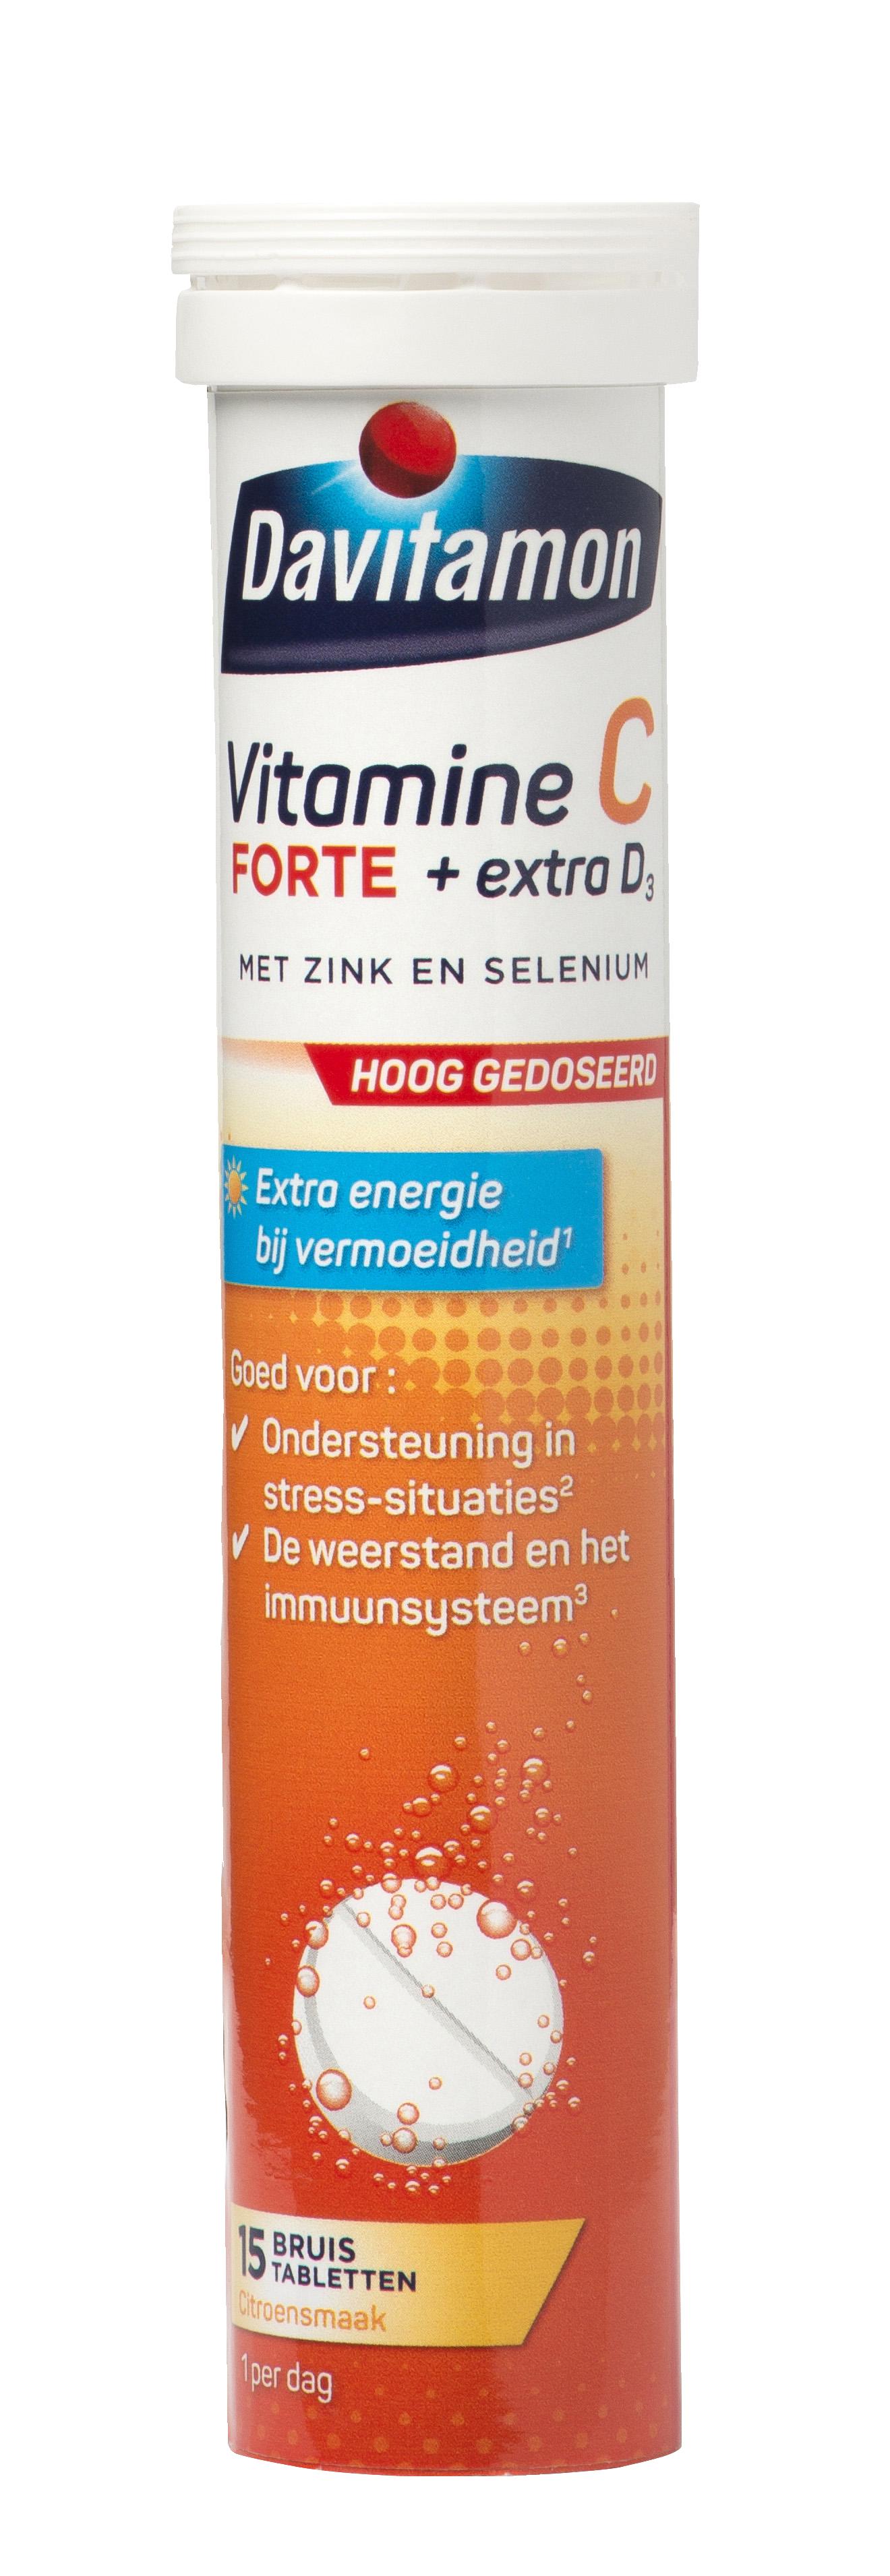 Davitamon Vitamine C Forte Bruistabletten Product